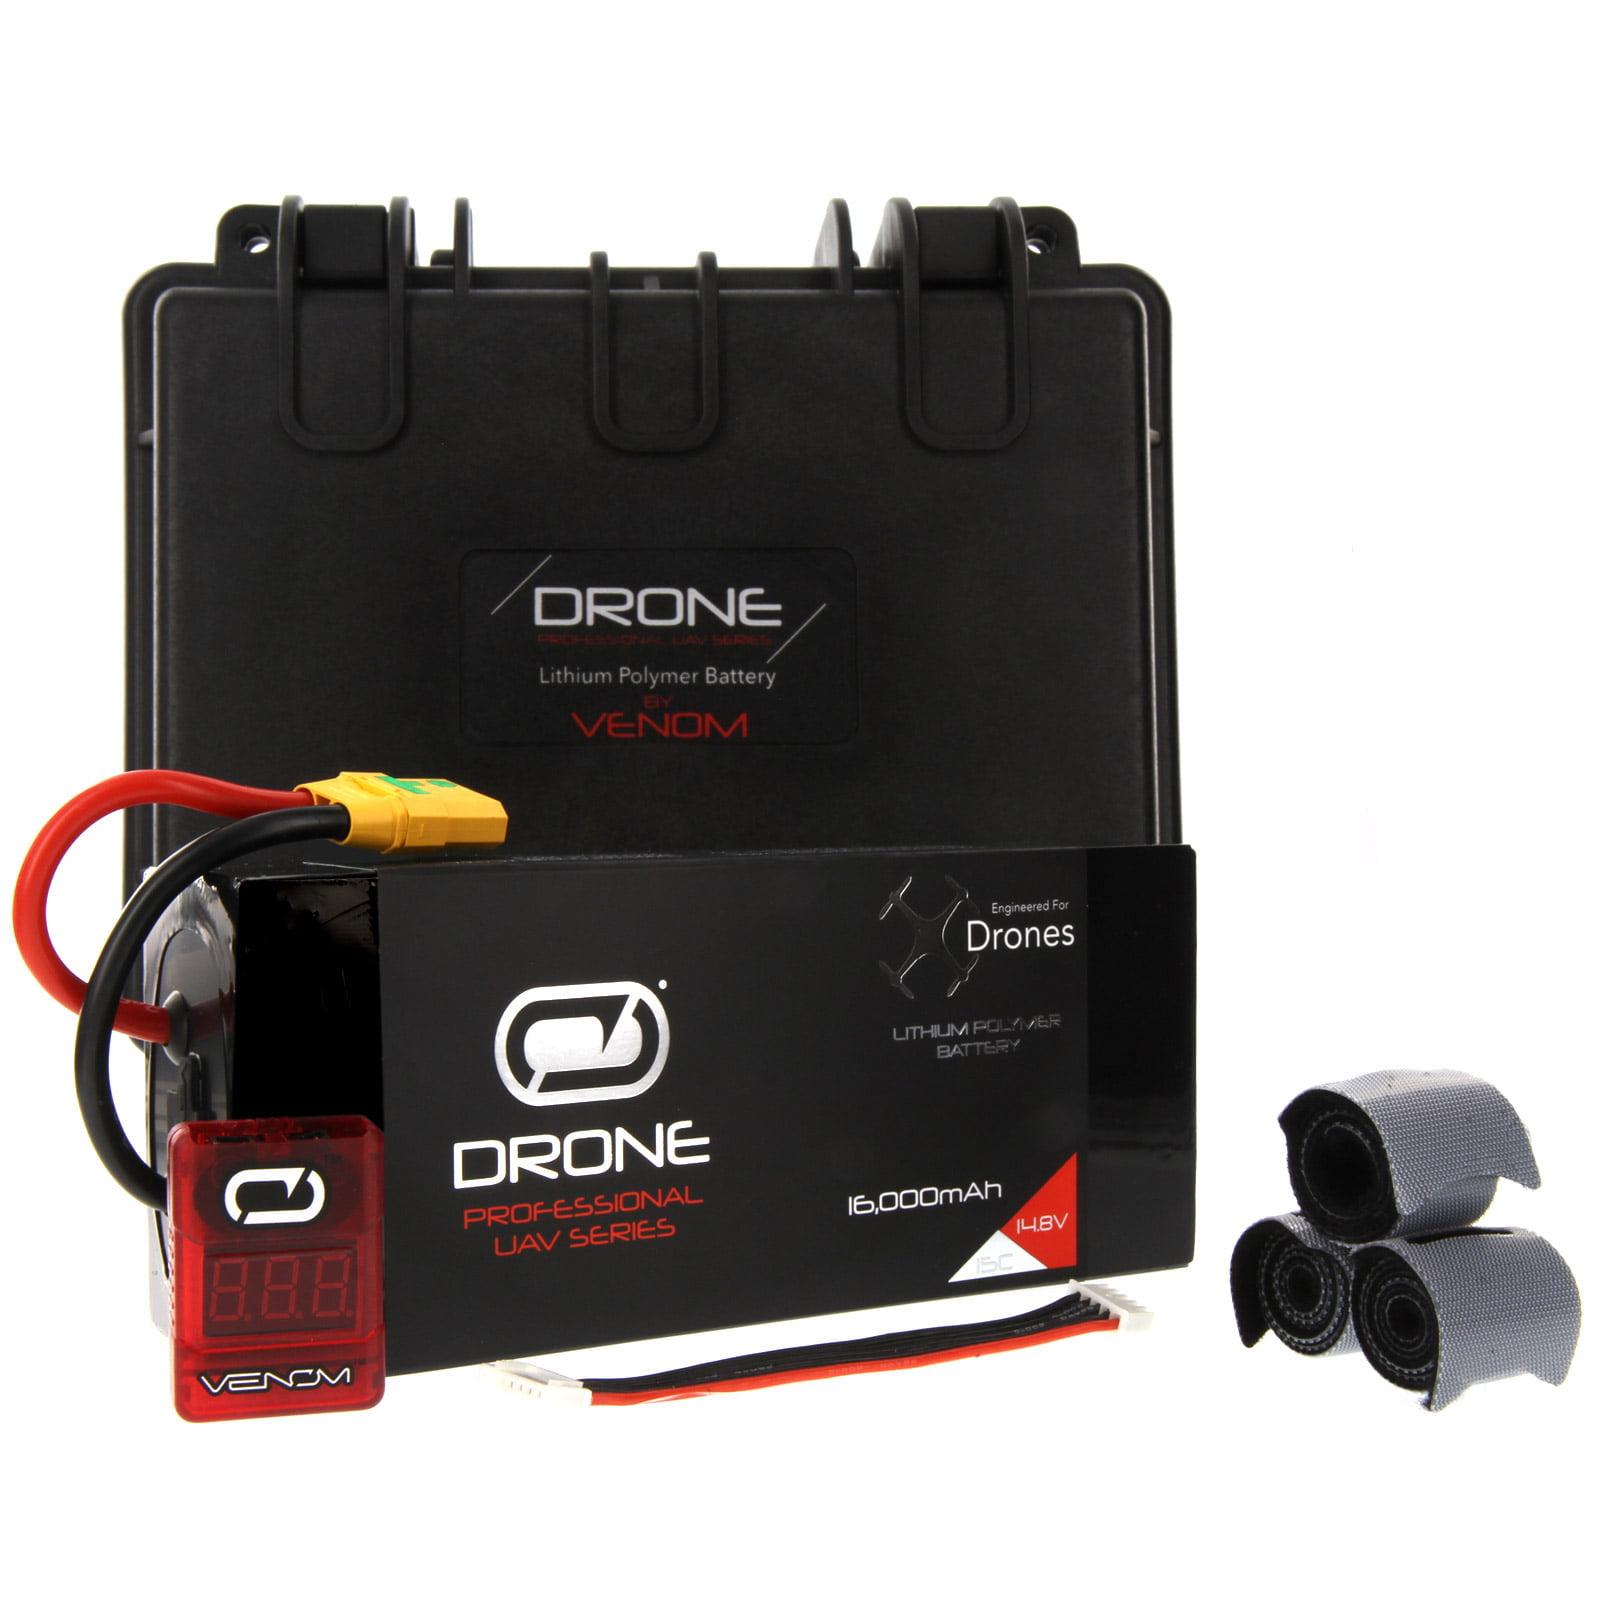 Tarot 690S 15C 4S 16000mAh 14.8V LiPo Drone Pro Battery w/ XT90-S plug by Venom